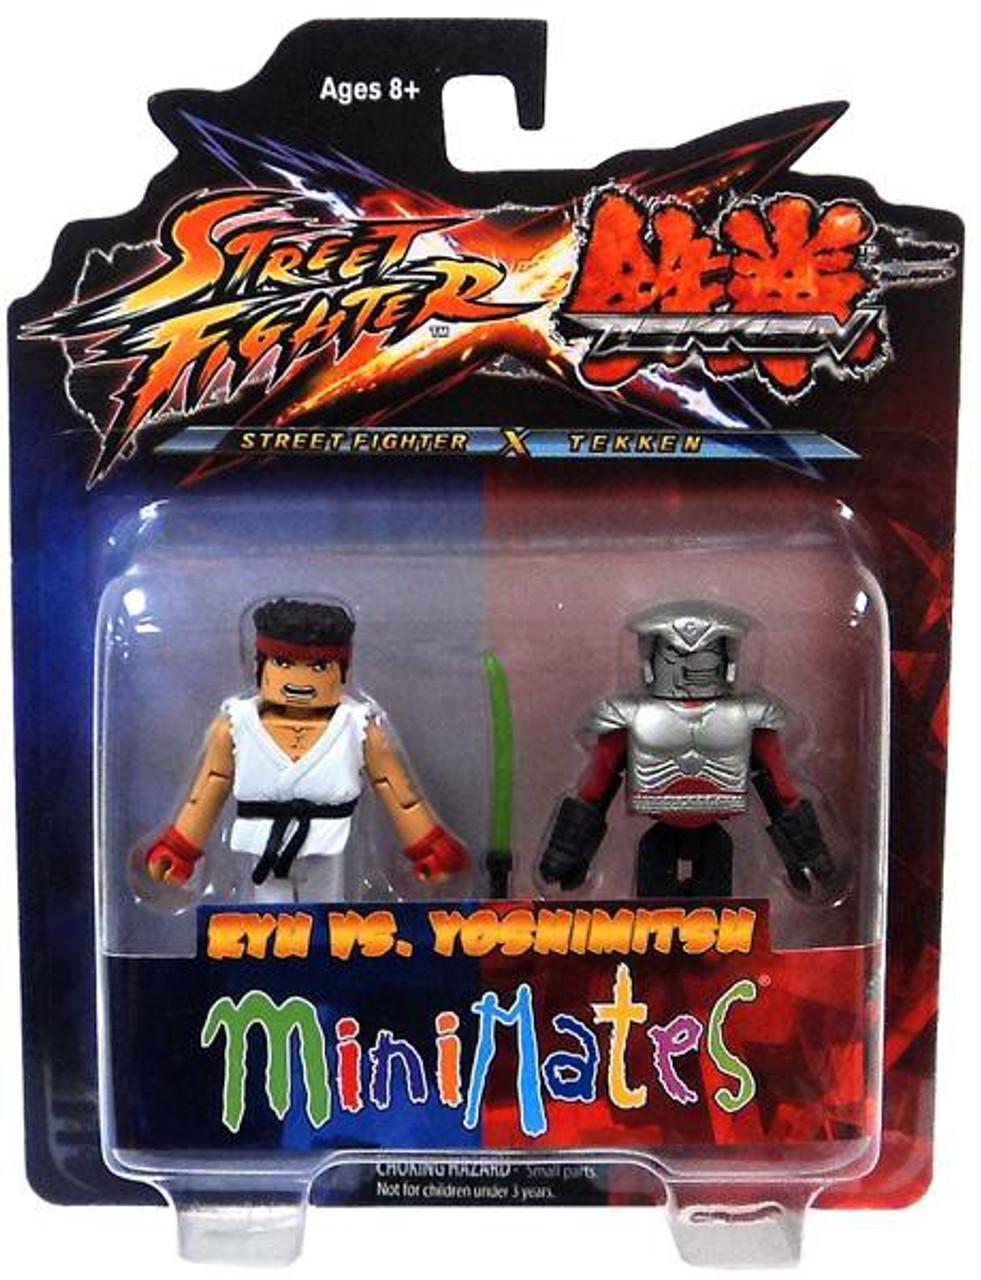 Street Fighter X Tekken Minimates Series 2 Ryu vs Yoshimitsu Minifigure 2-Pack